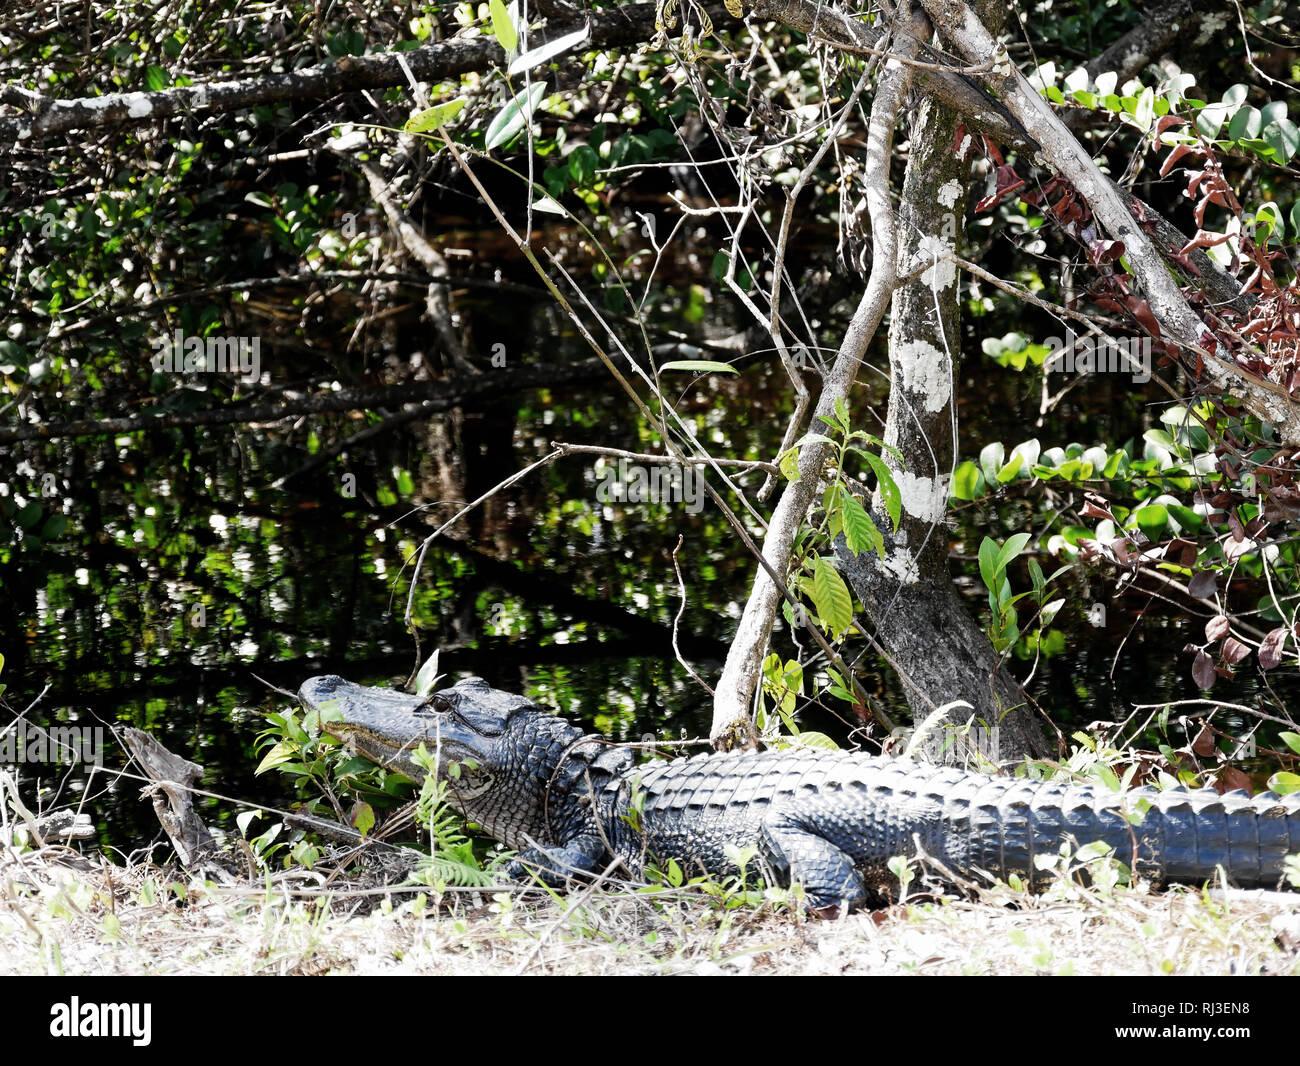 Aligator on land - Stock Image